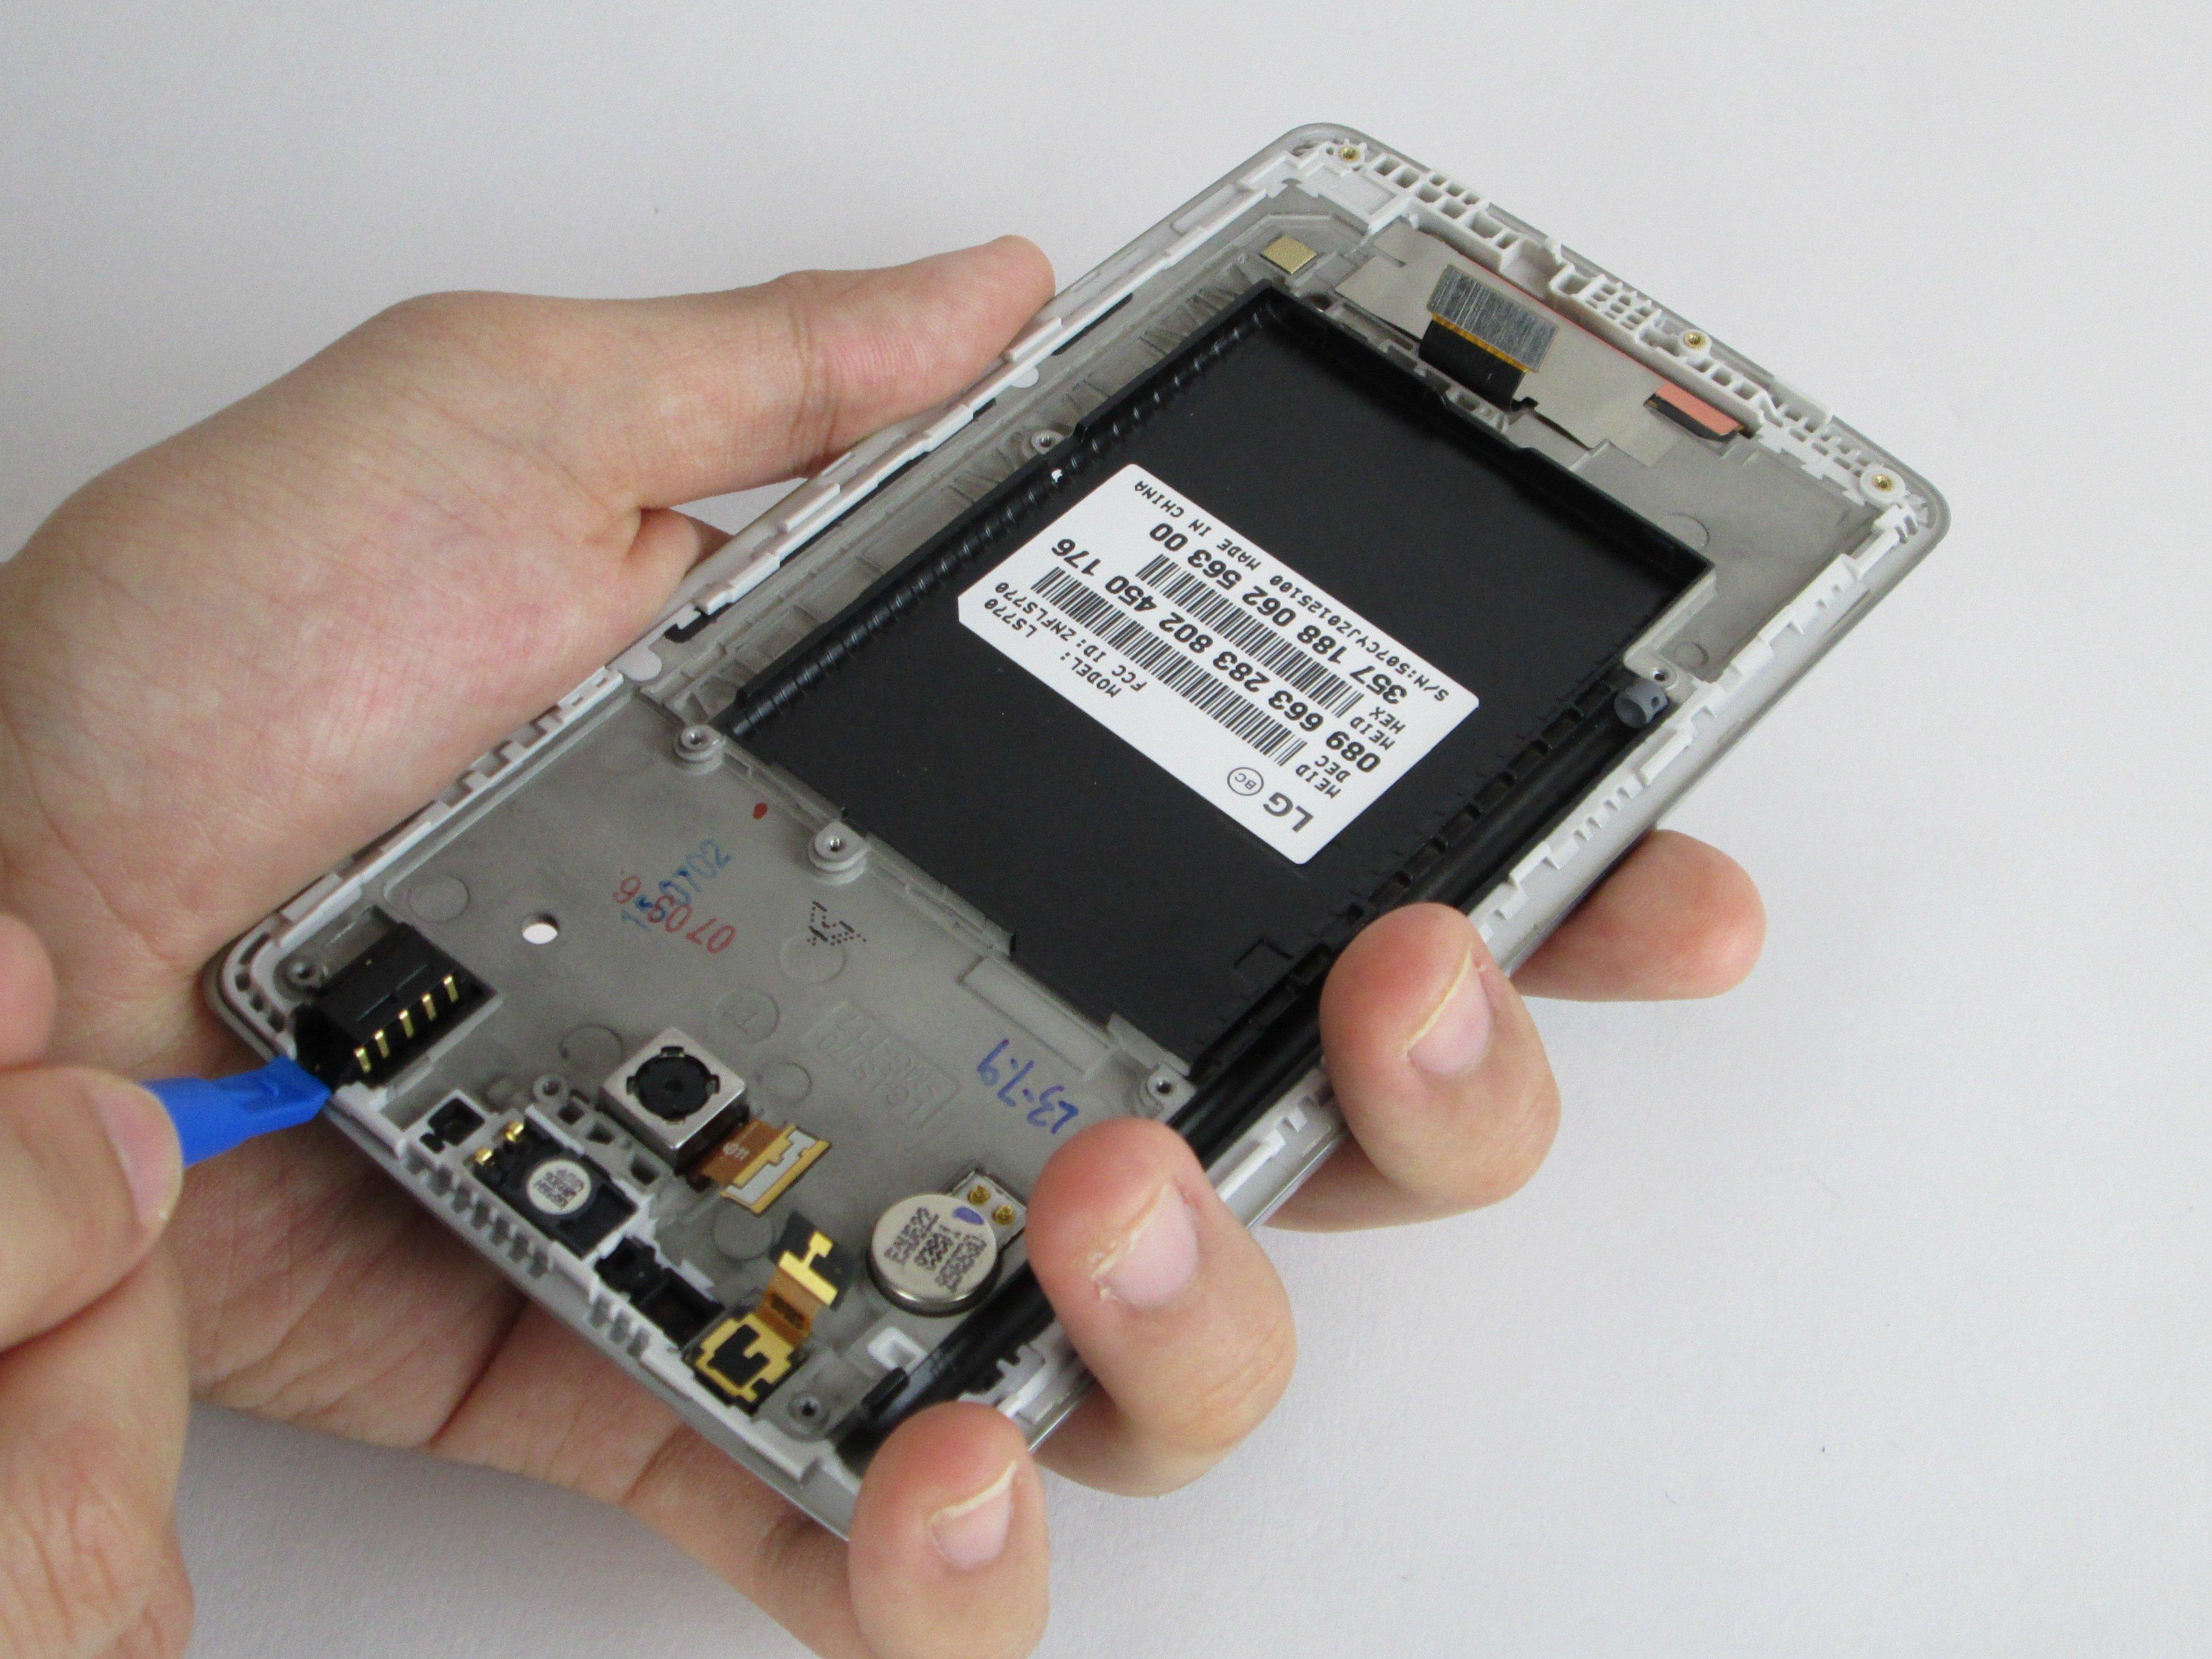 Apu Lg Stylo 4 Stylus Smartphone - TropicalWeather